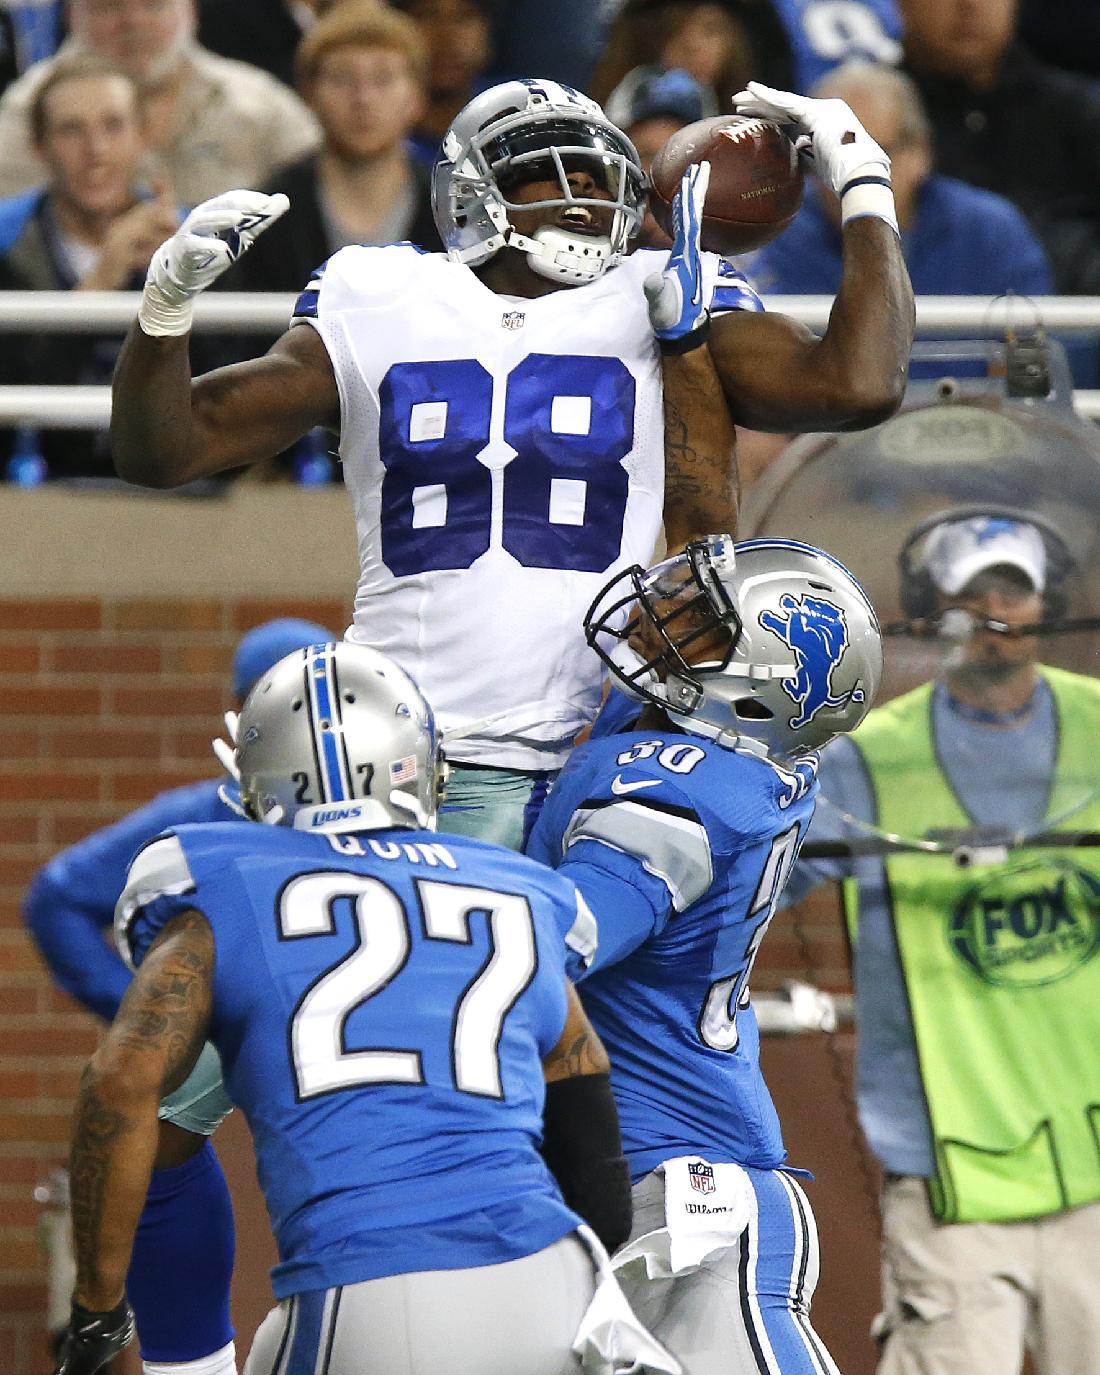 Romo backs Bryant, just like audio from rant